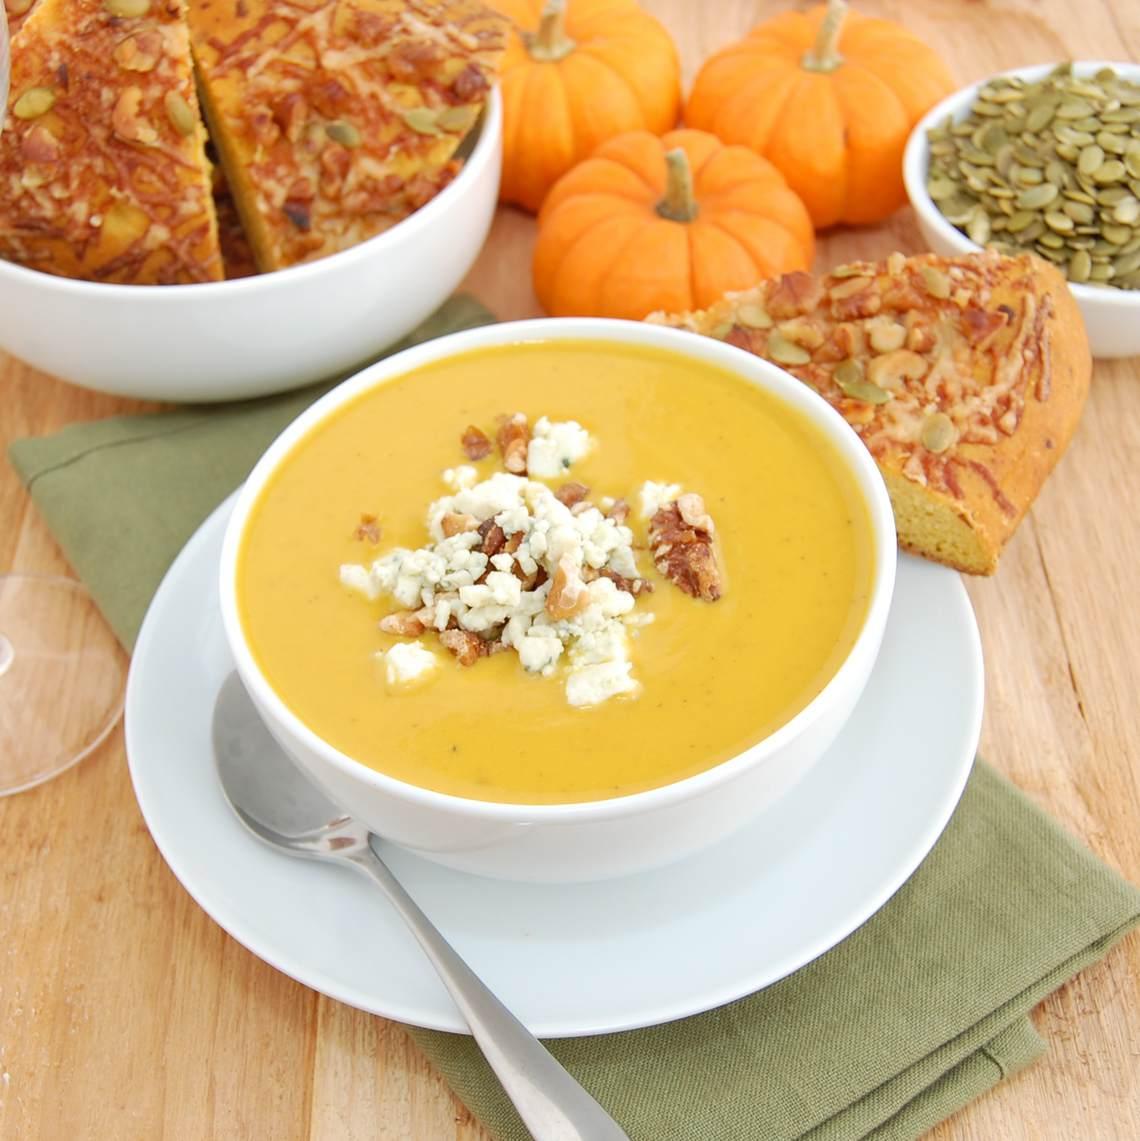 Party Hit Creamy Pumpkin Soup Recipe : Glorious Soup Recipes